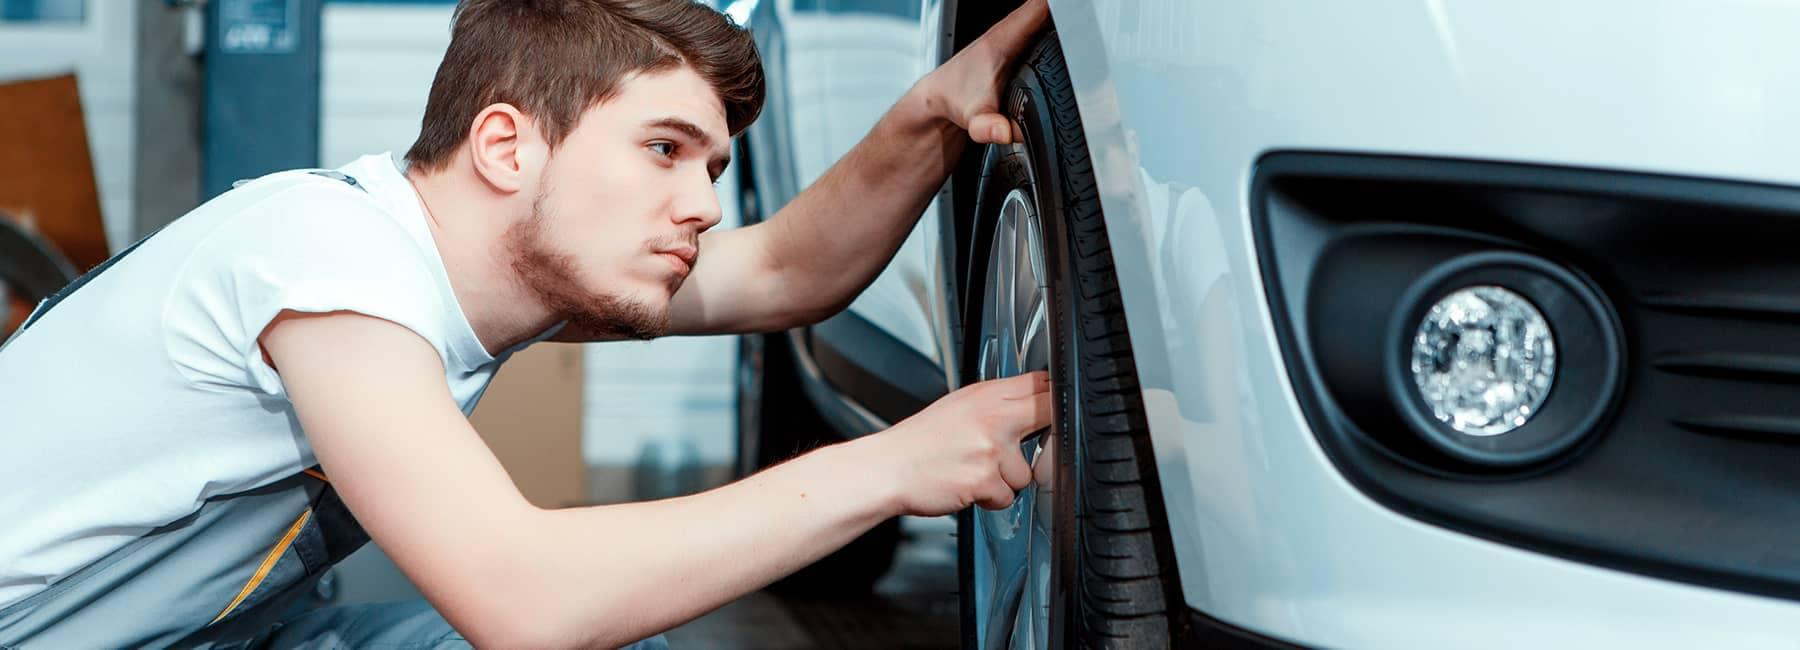 technician checking car tire